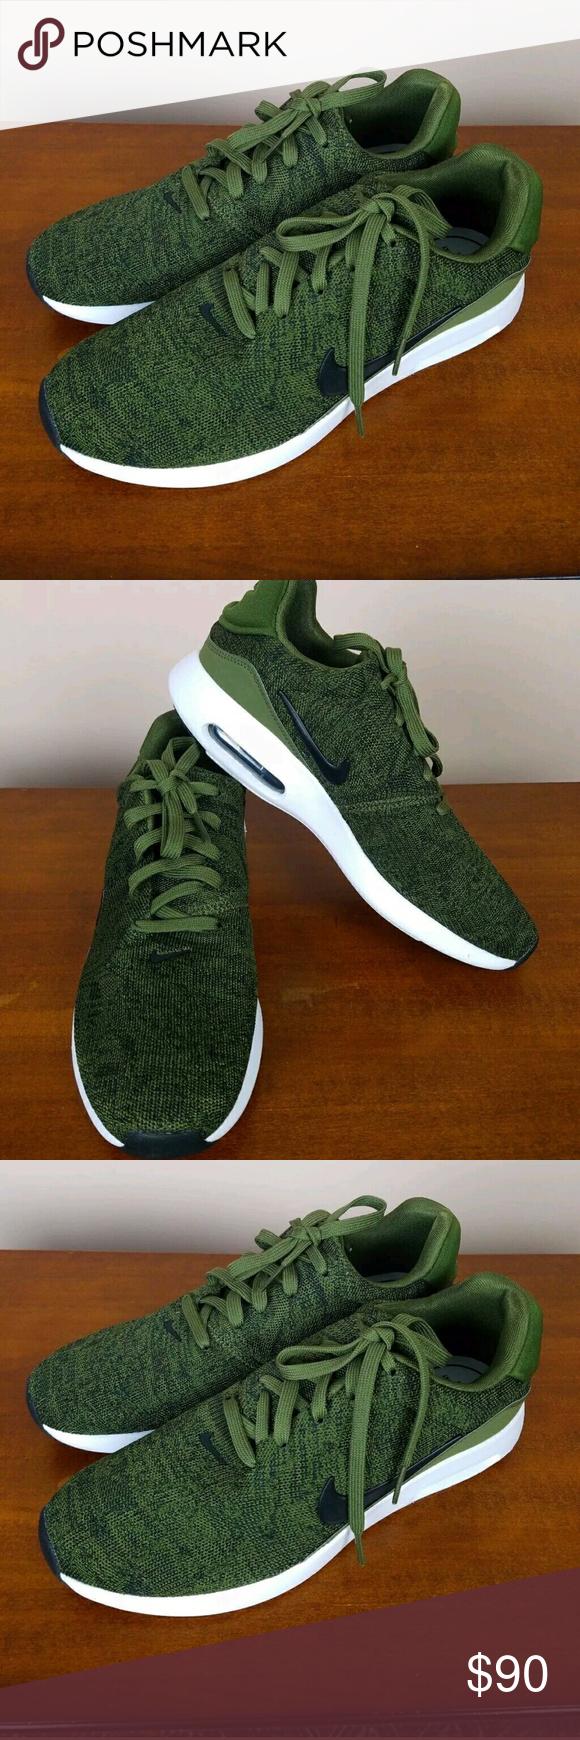 Mens Nike Air Max Modern Flyknit Khaki Green Sz 8 NWT   My